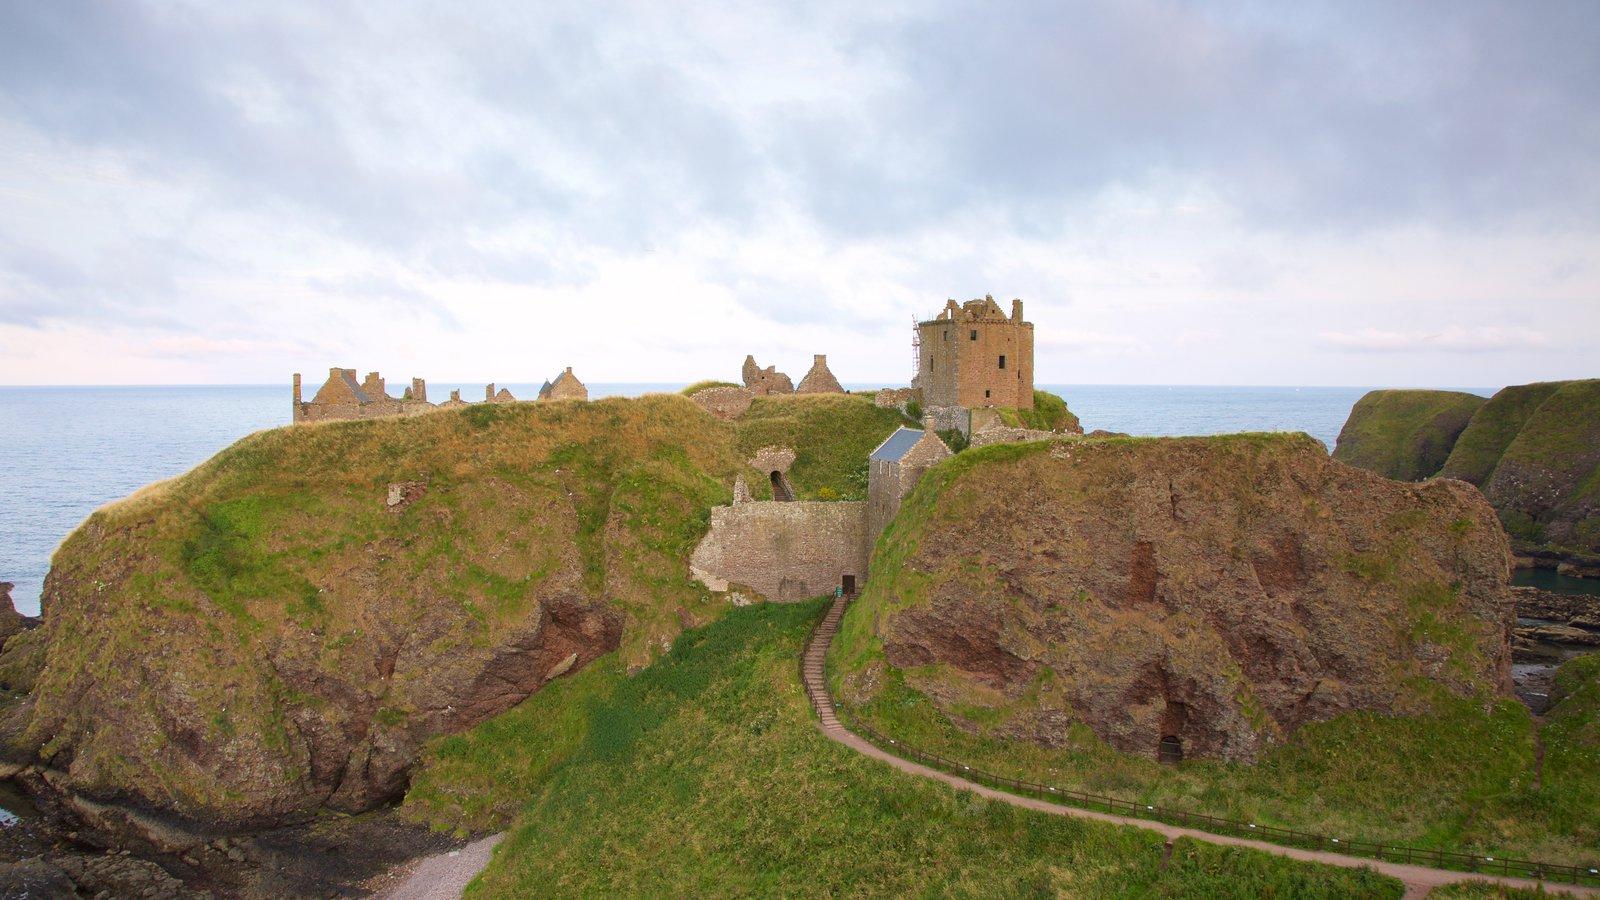 Dunnottar Castle featuring farmland, a castle and general coastal views